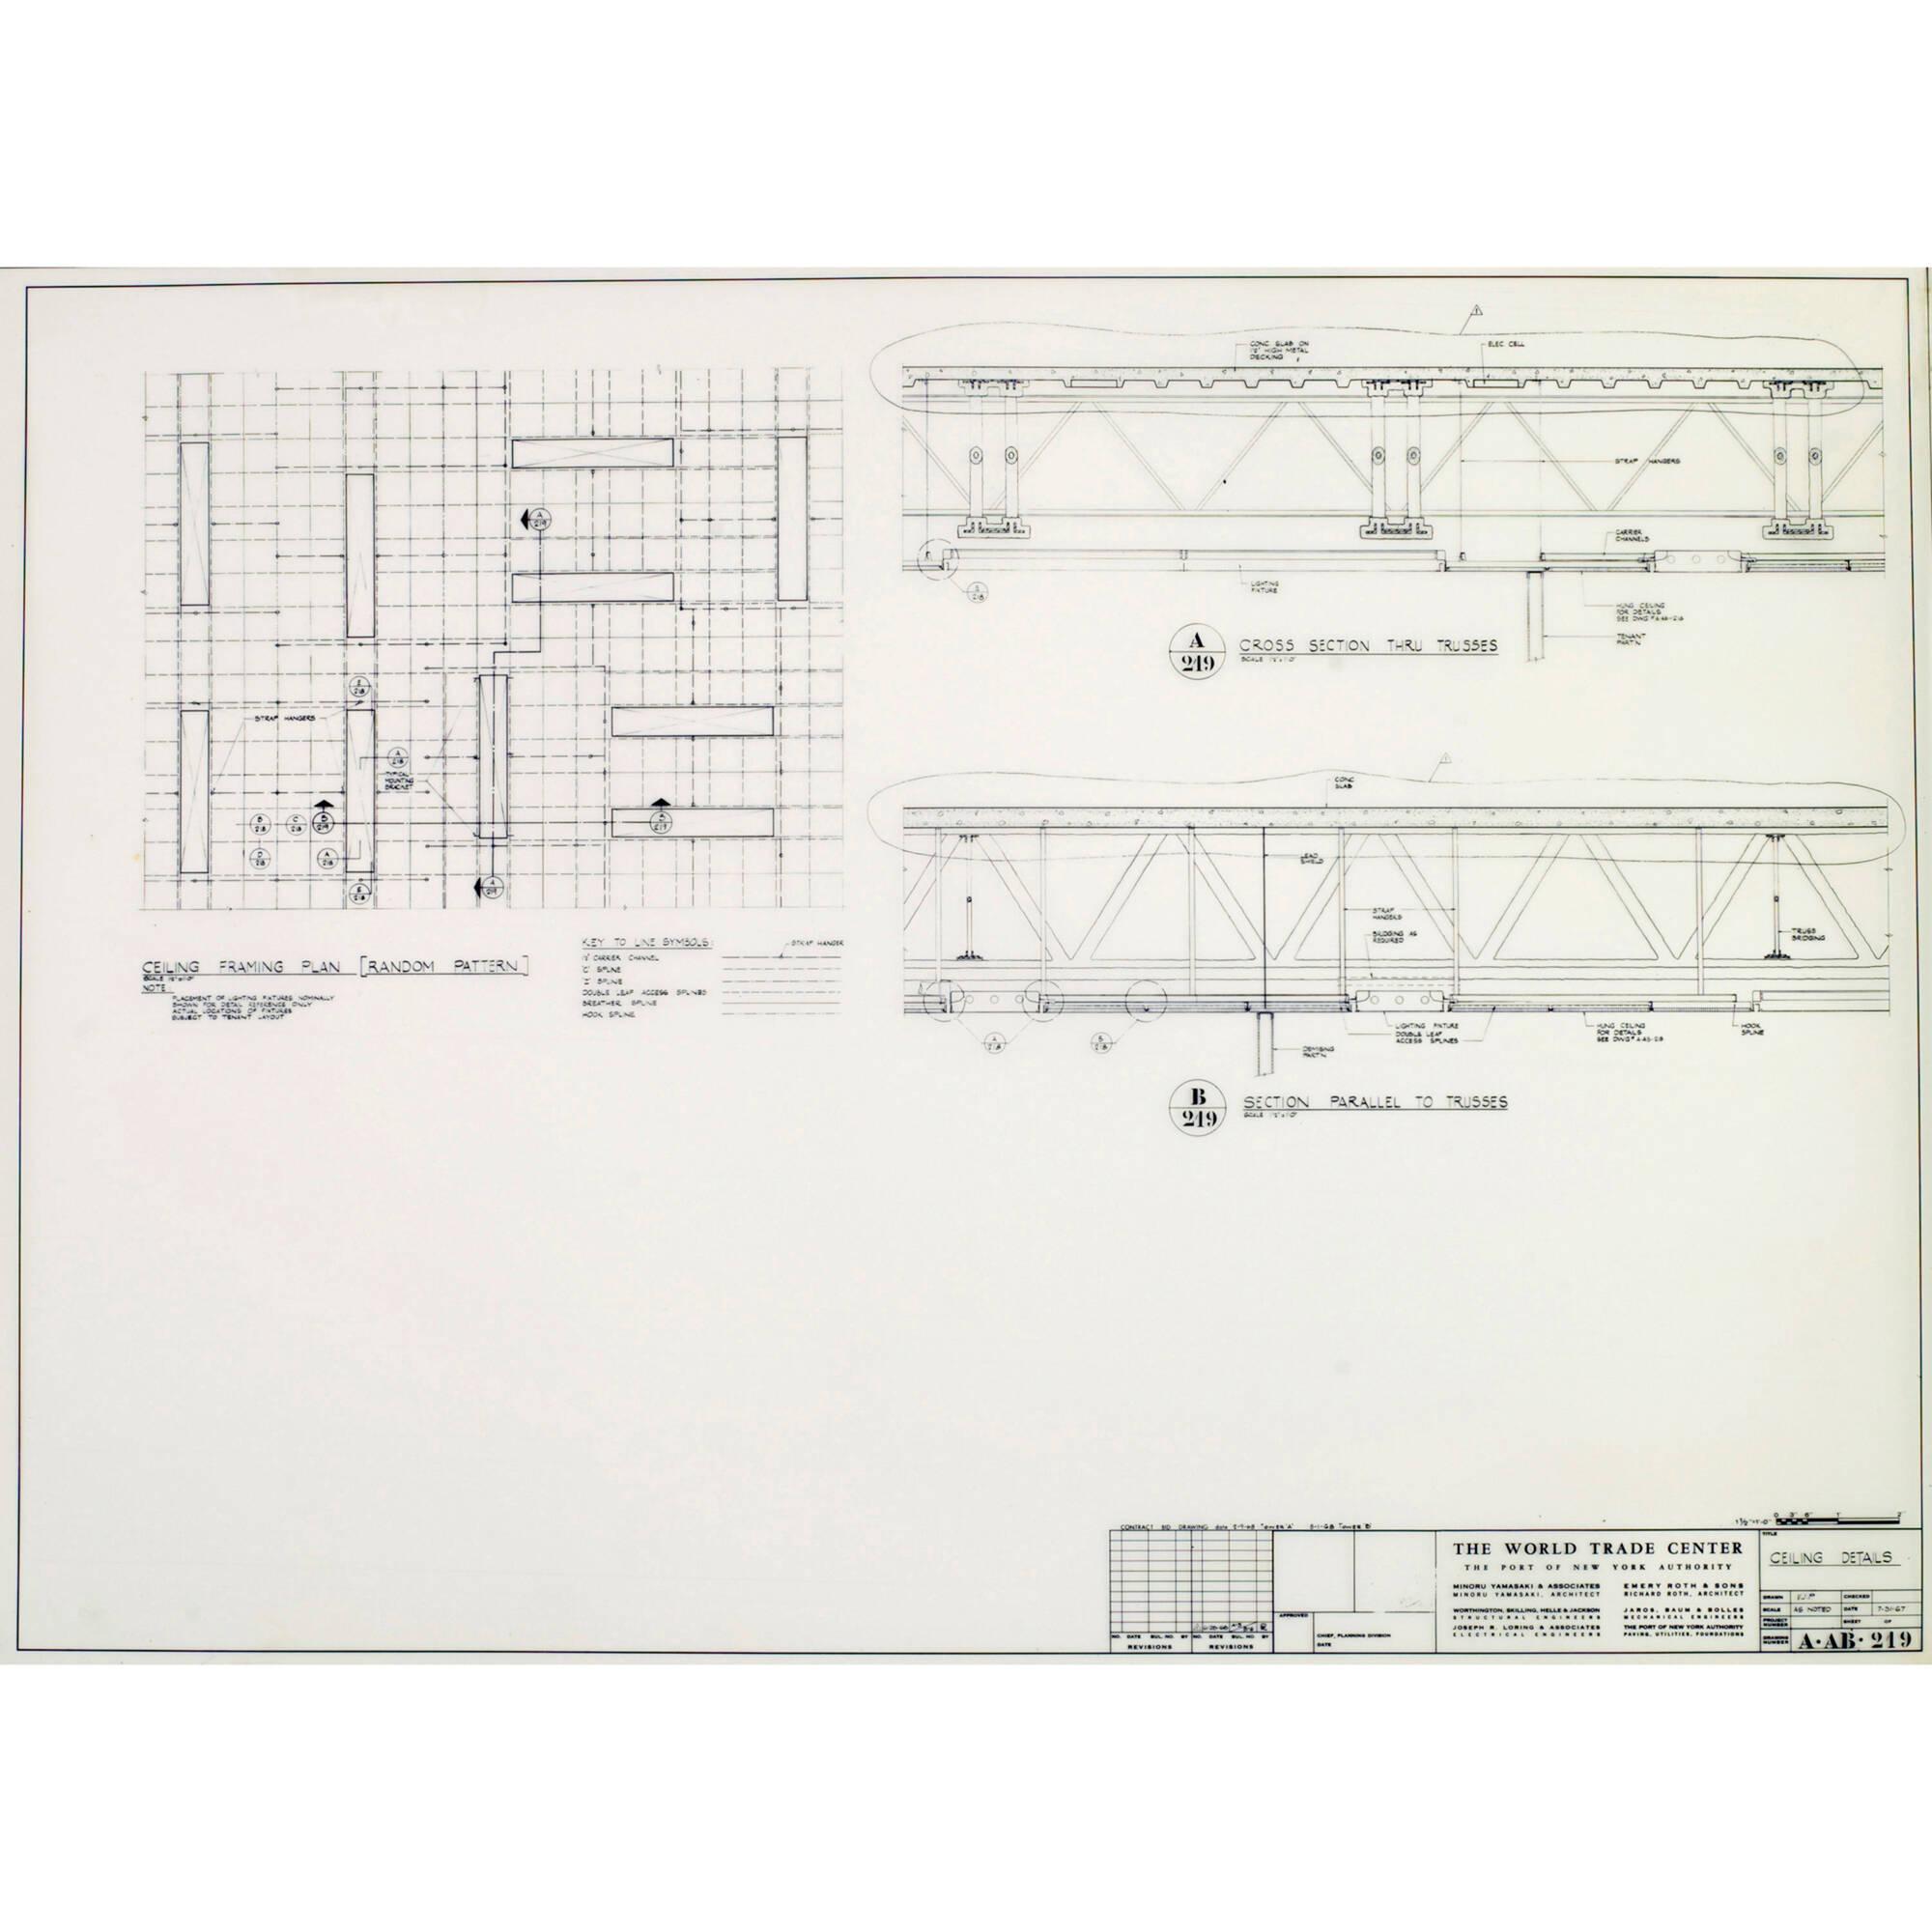 small resolution of 500 minoru yamasaki associates world trade center north tower ceiling details